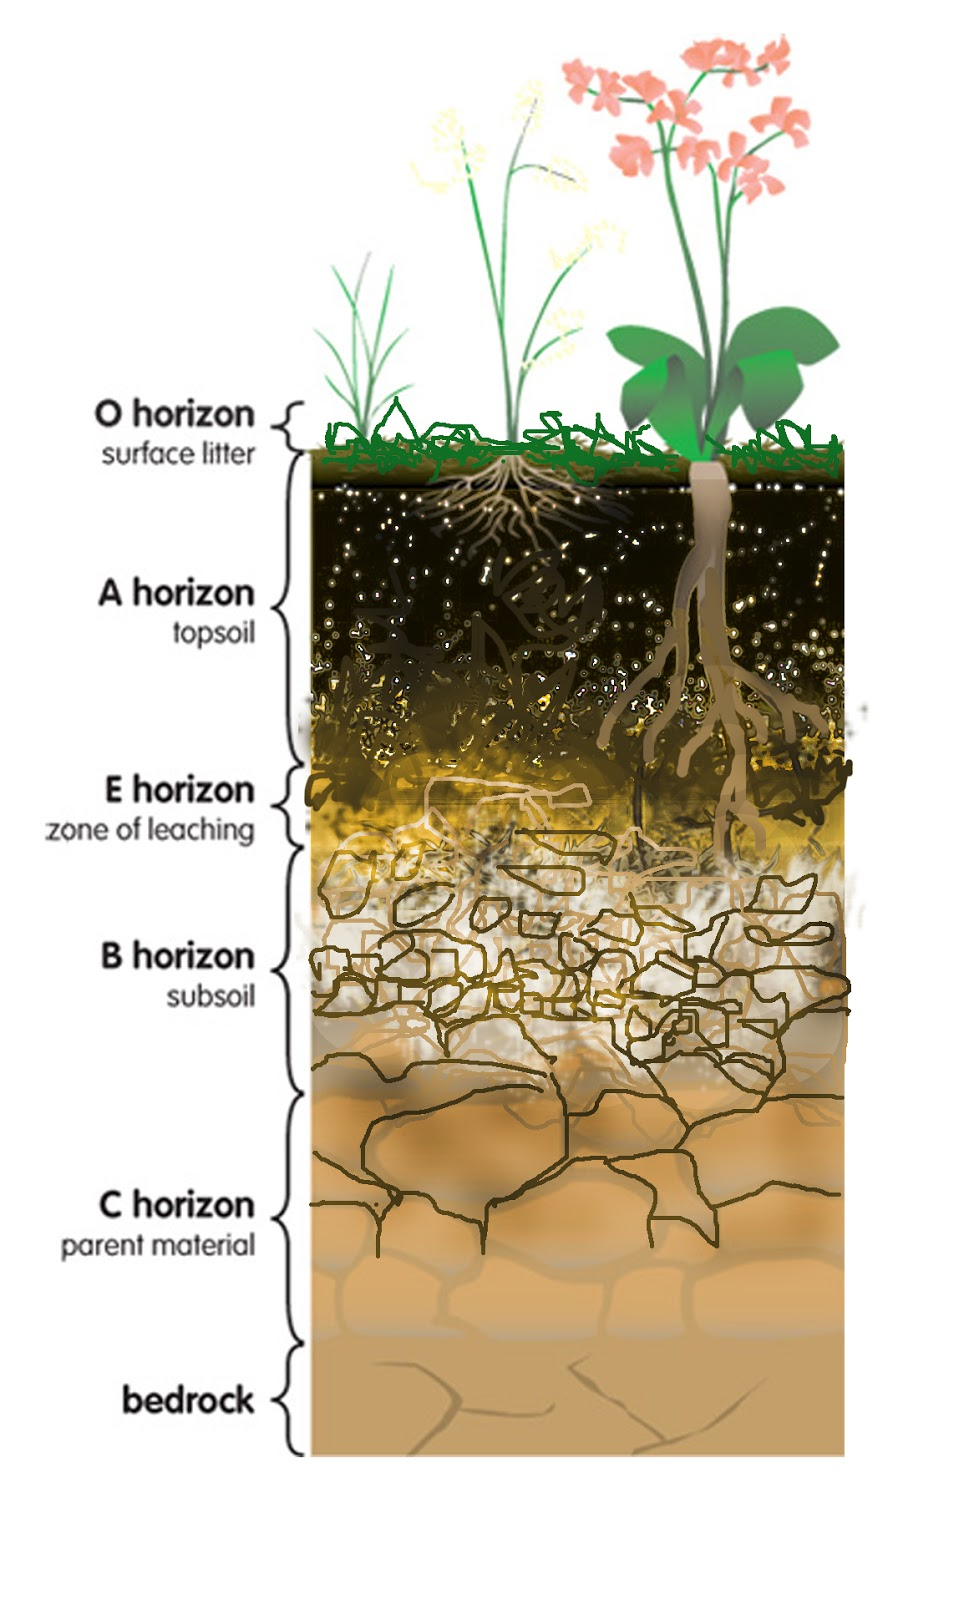 Soil Horizon Layers Diagram : LONG HAIRSTYLES